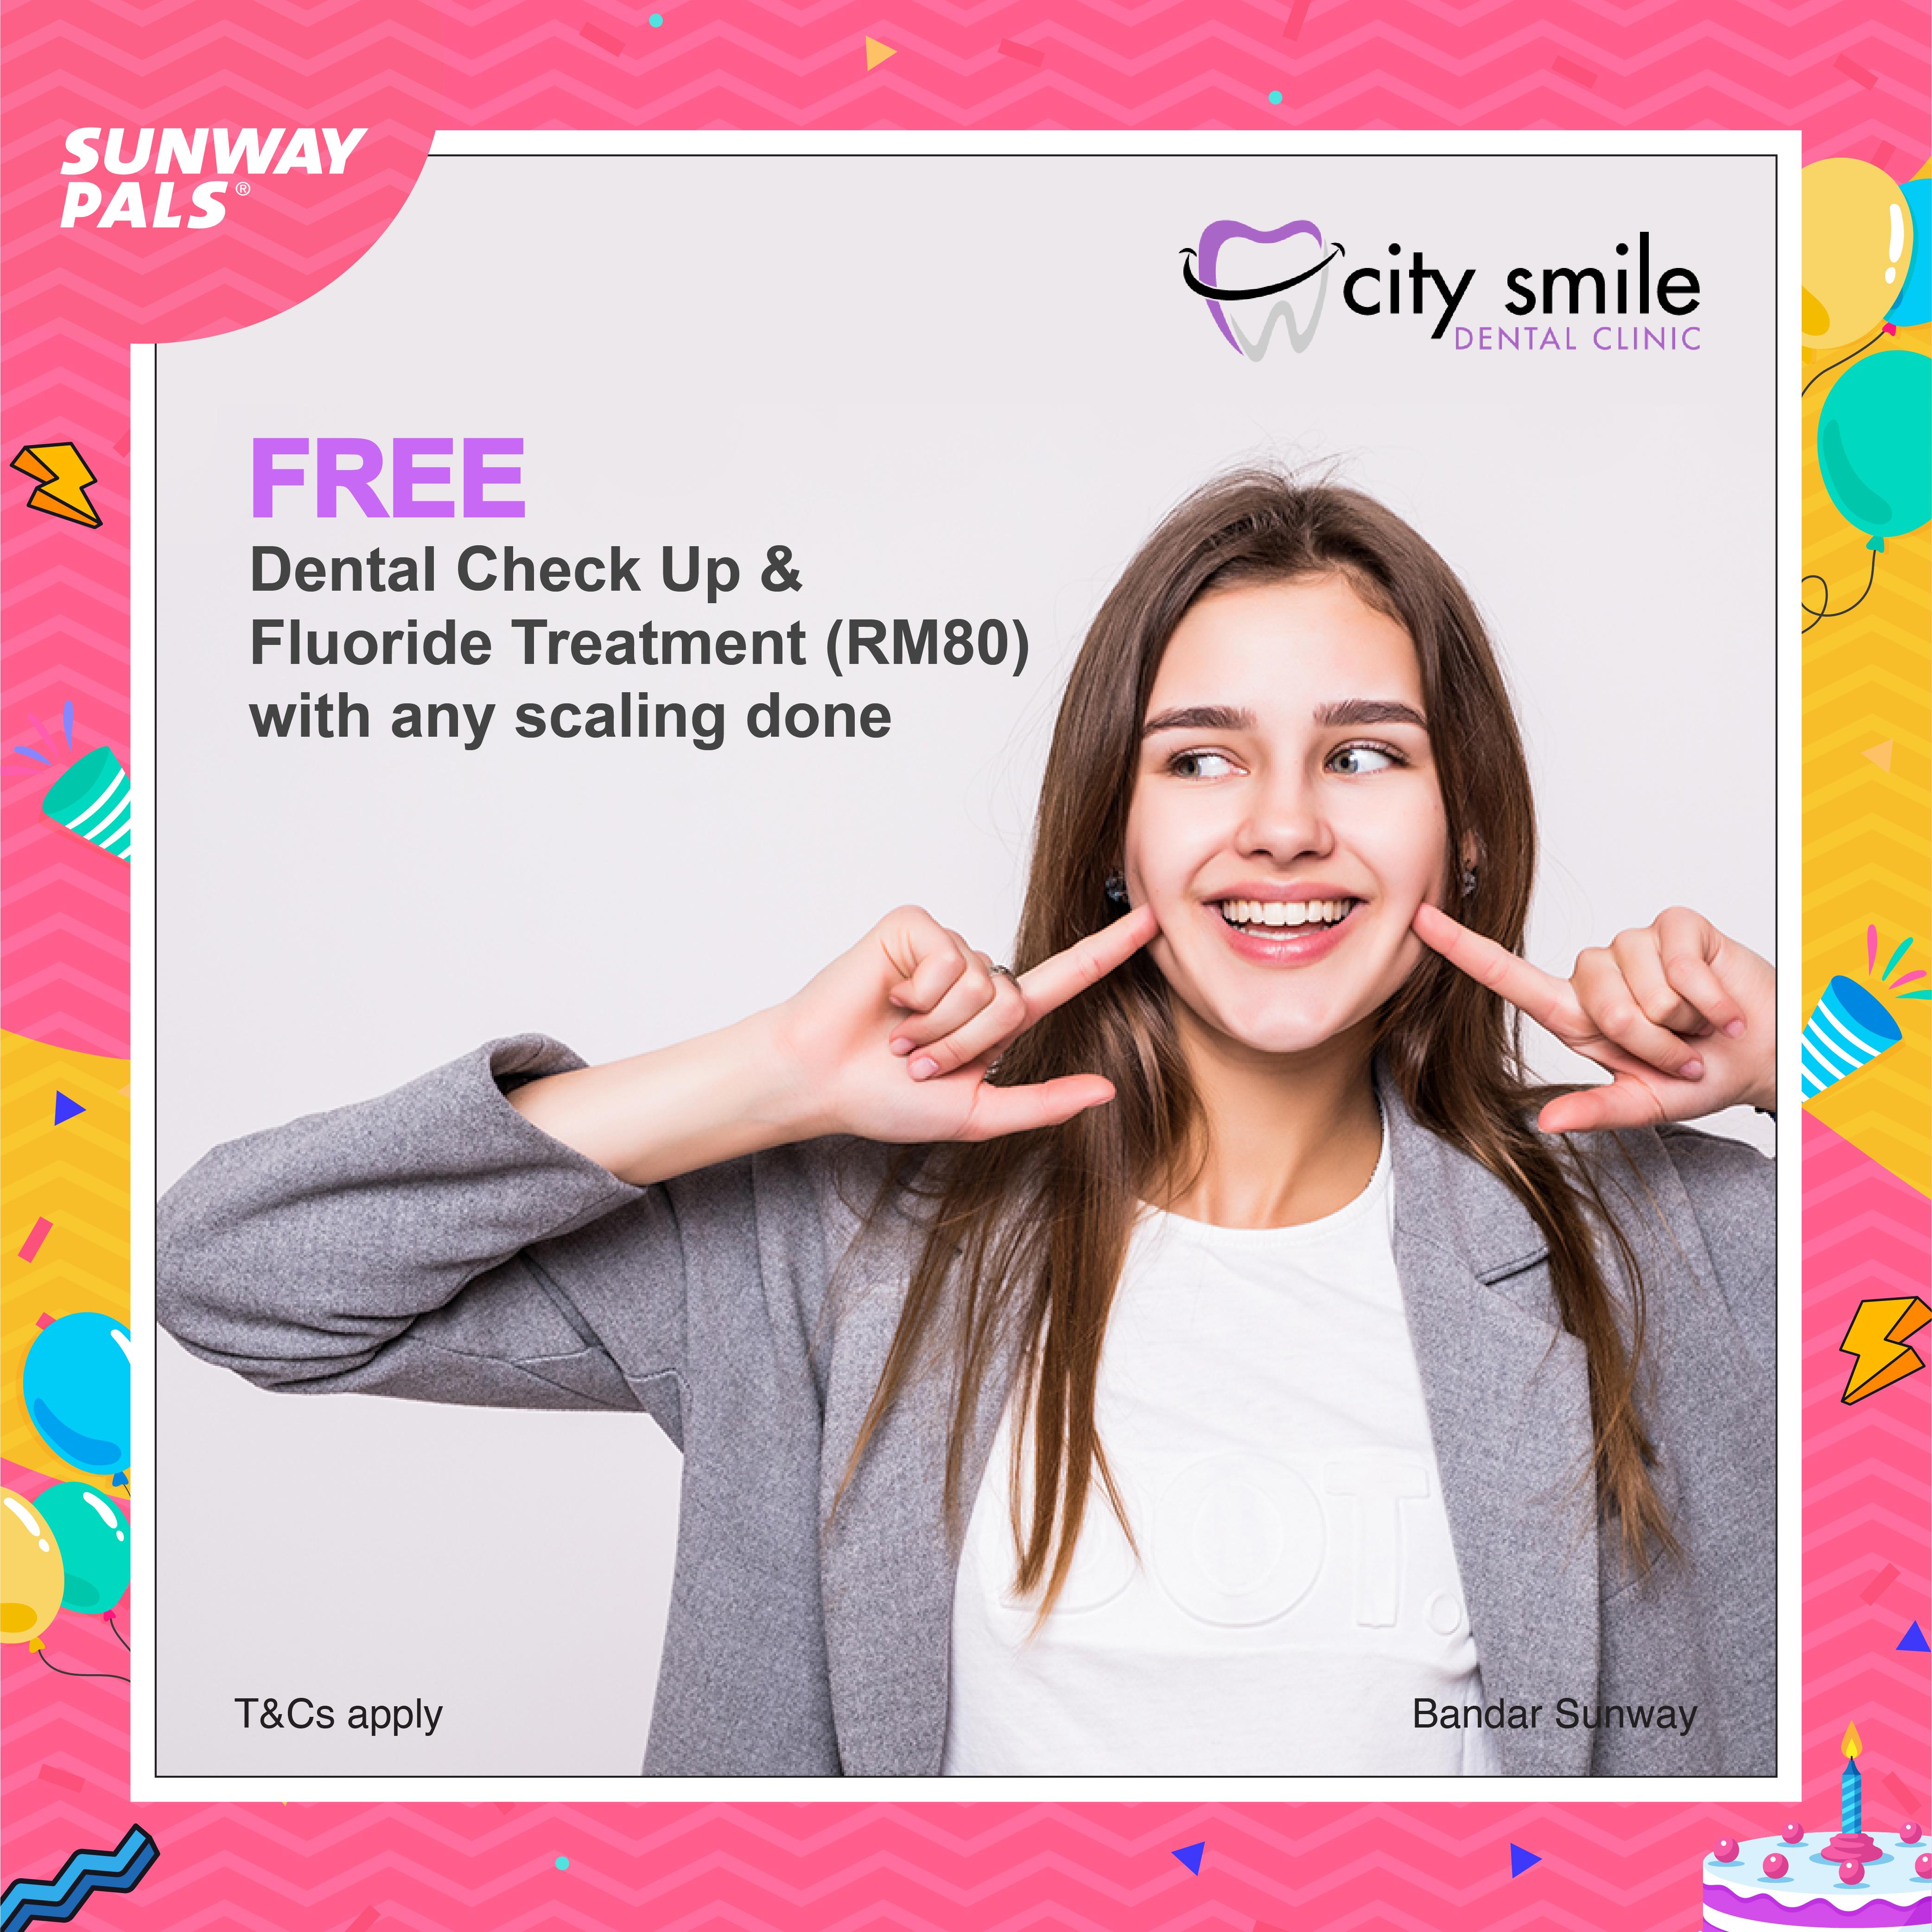 FREE Dental Check-up & Fluoride Treatment